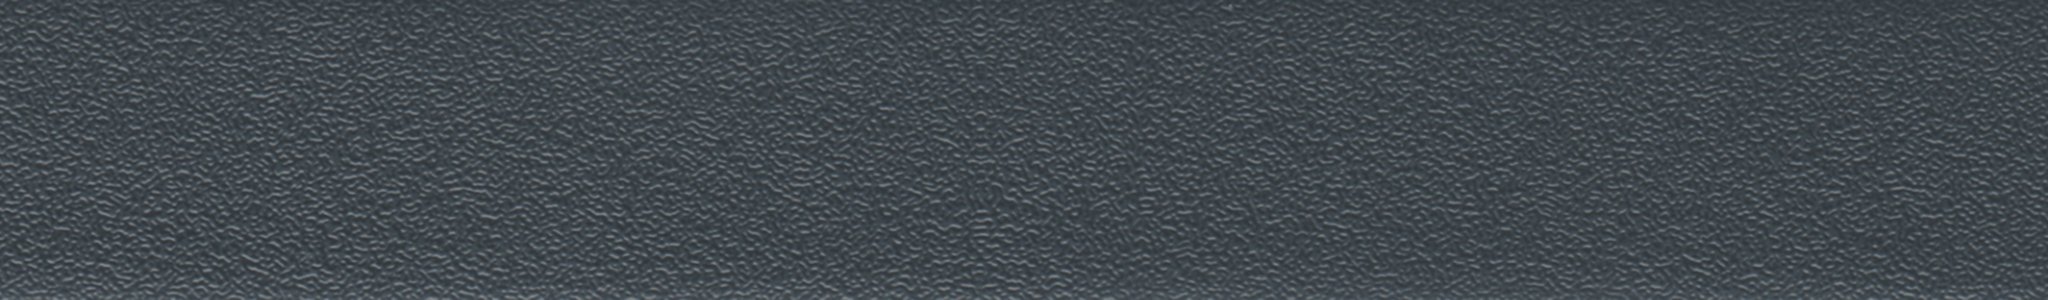 HU 17011 кромка ABS серая жемчуг 101